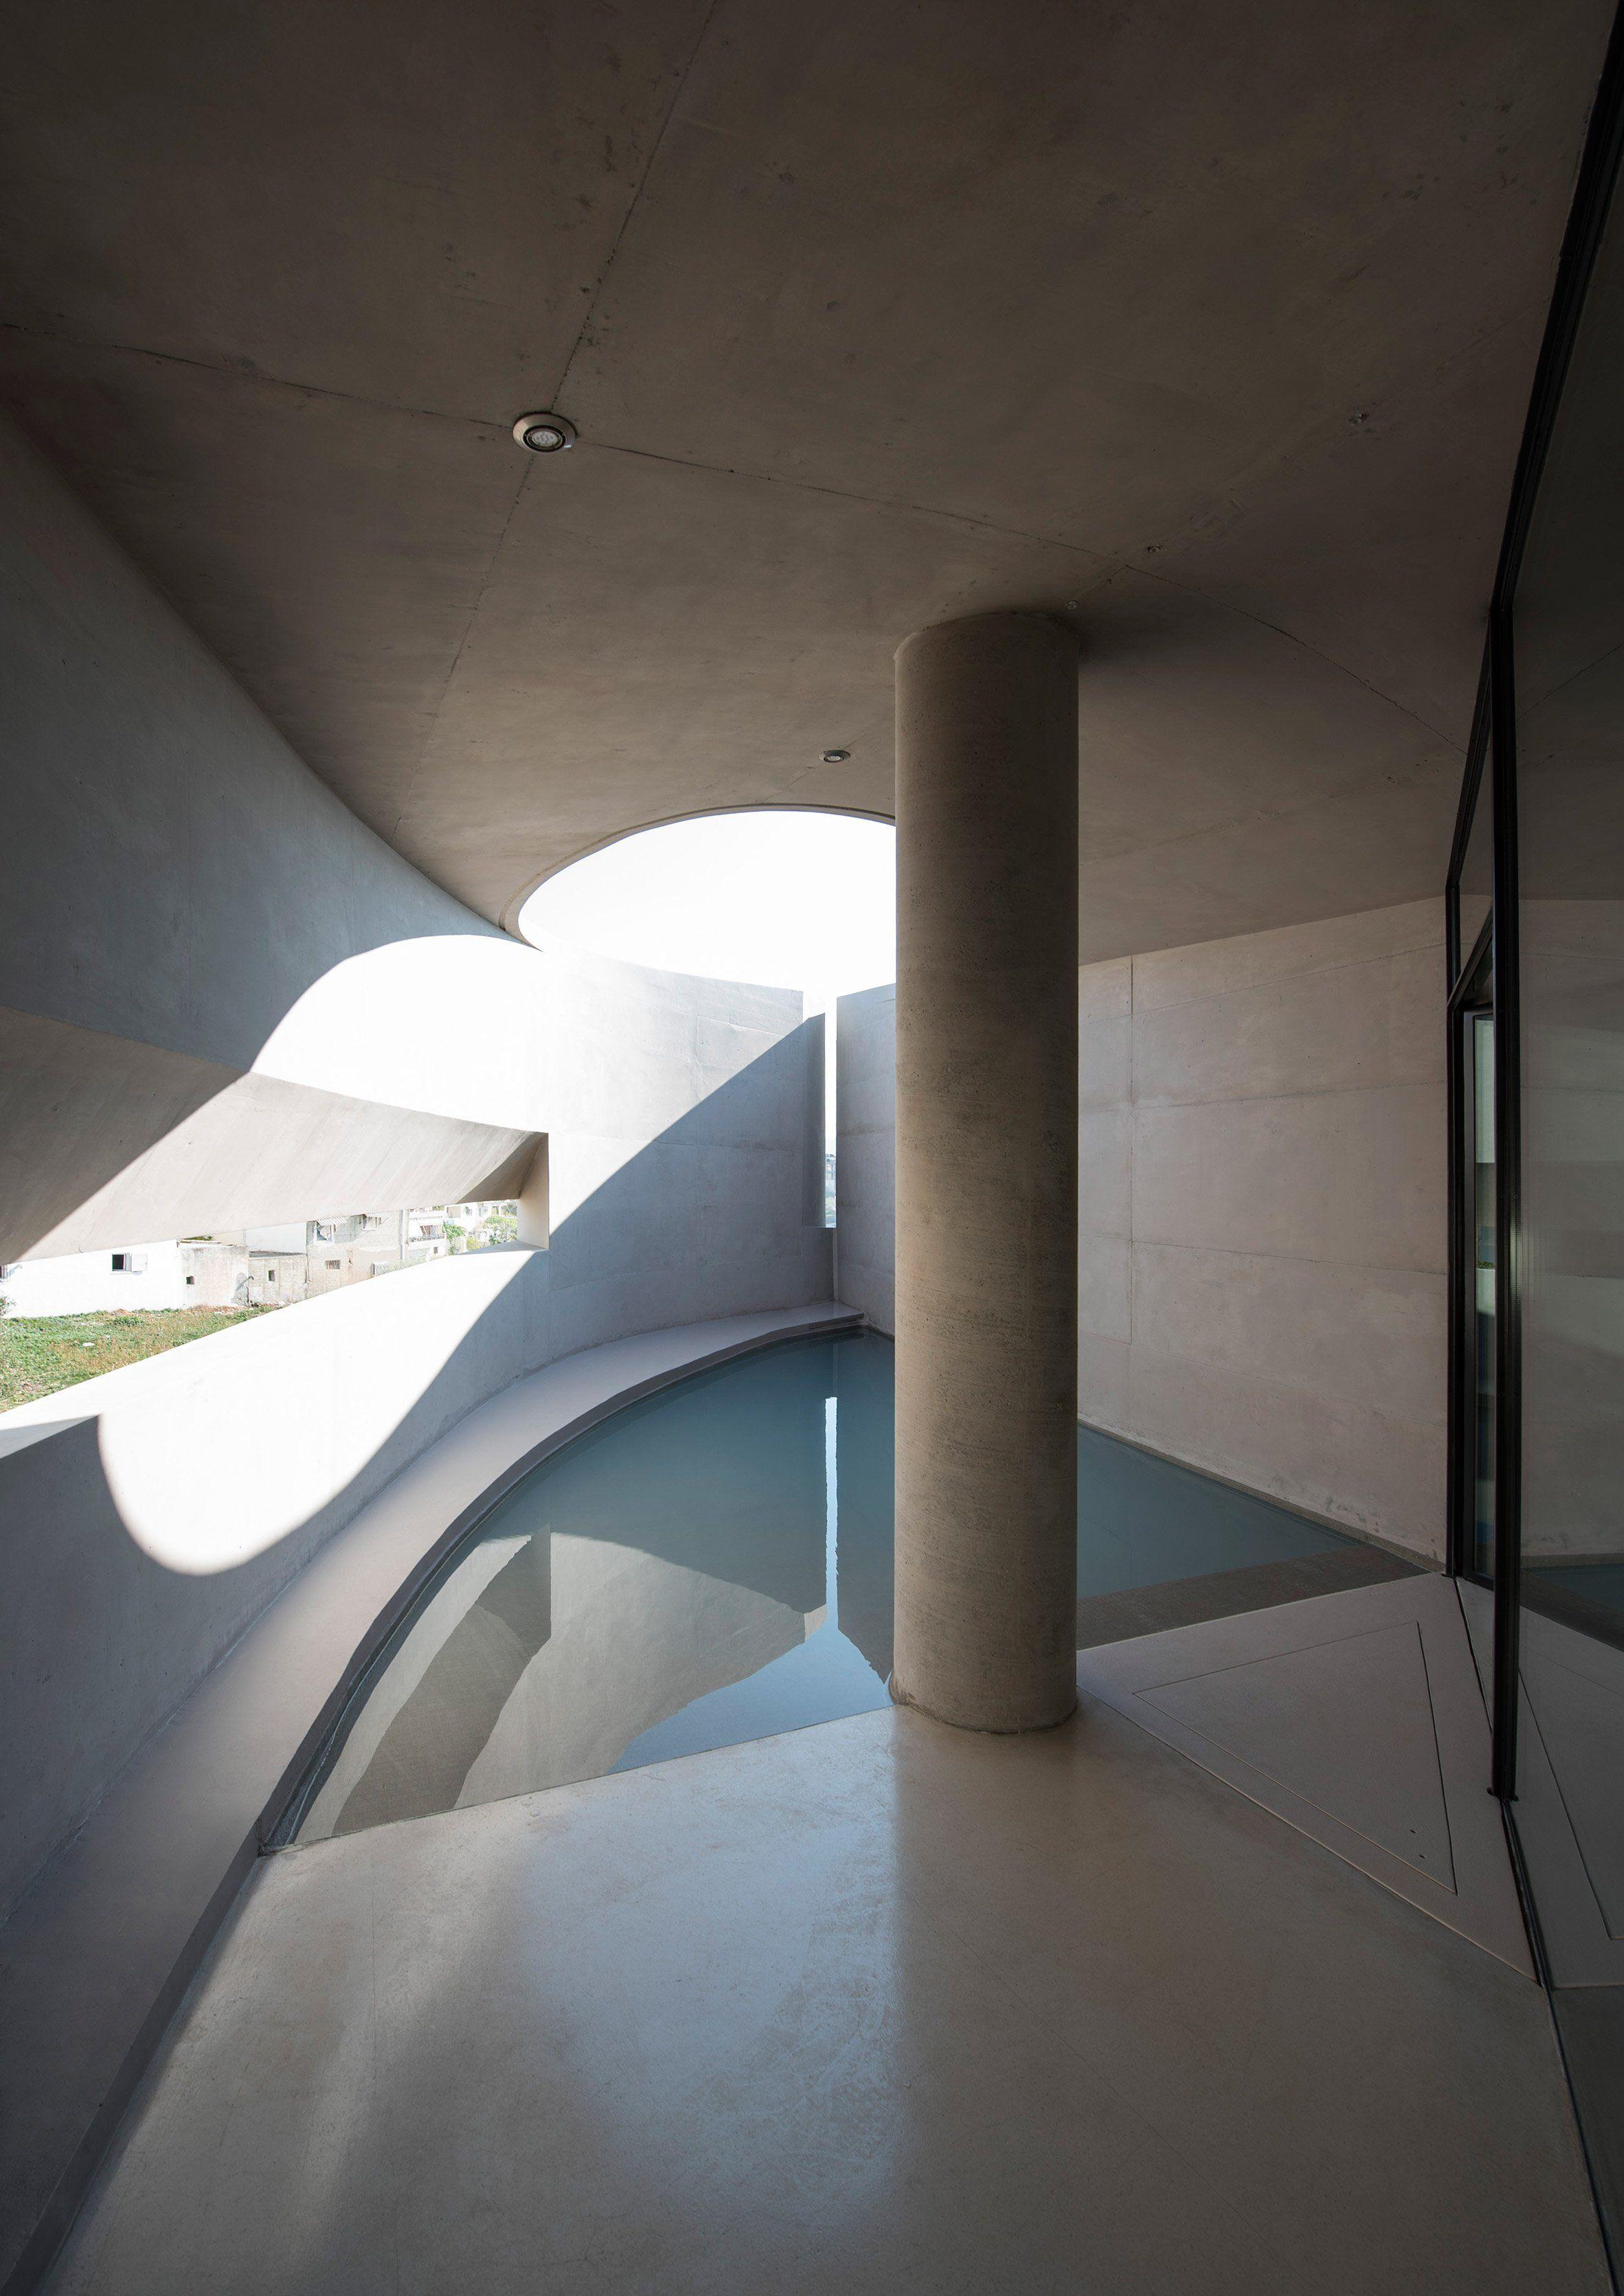 House in Heraklion by Tense Architecture Crete